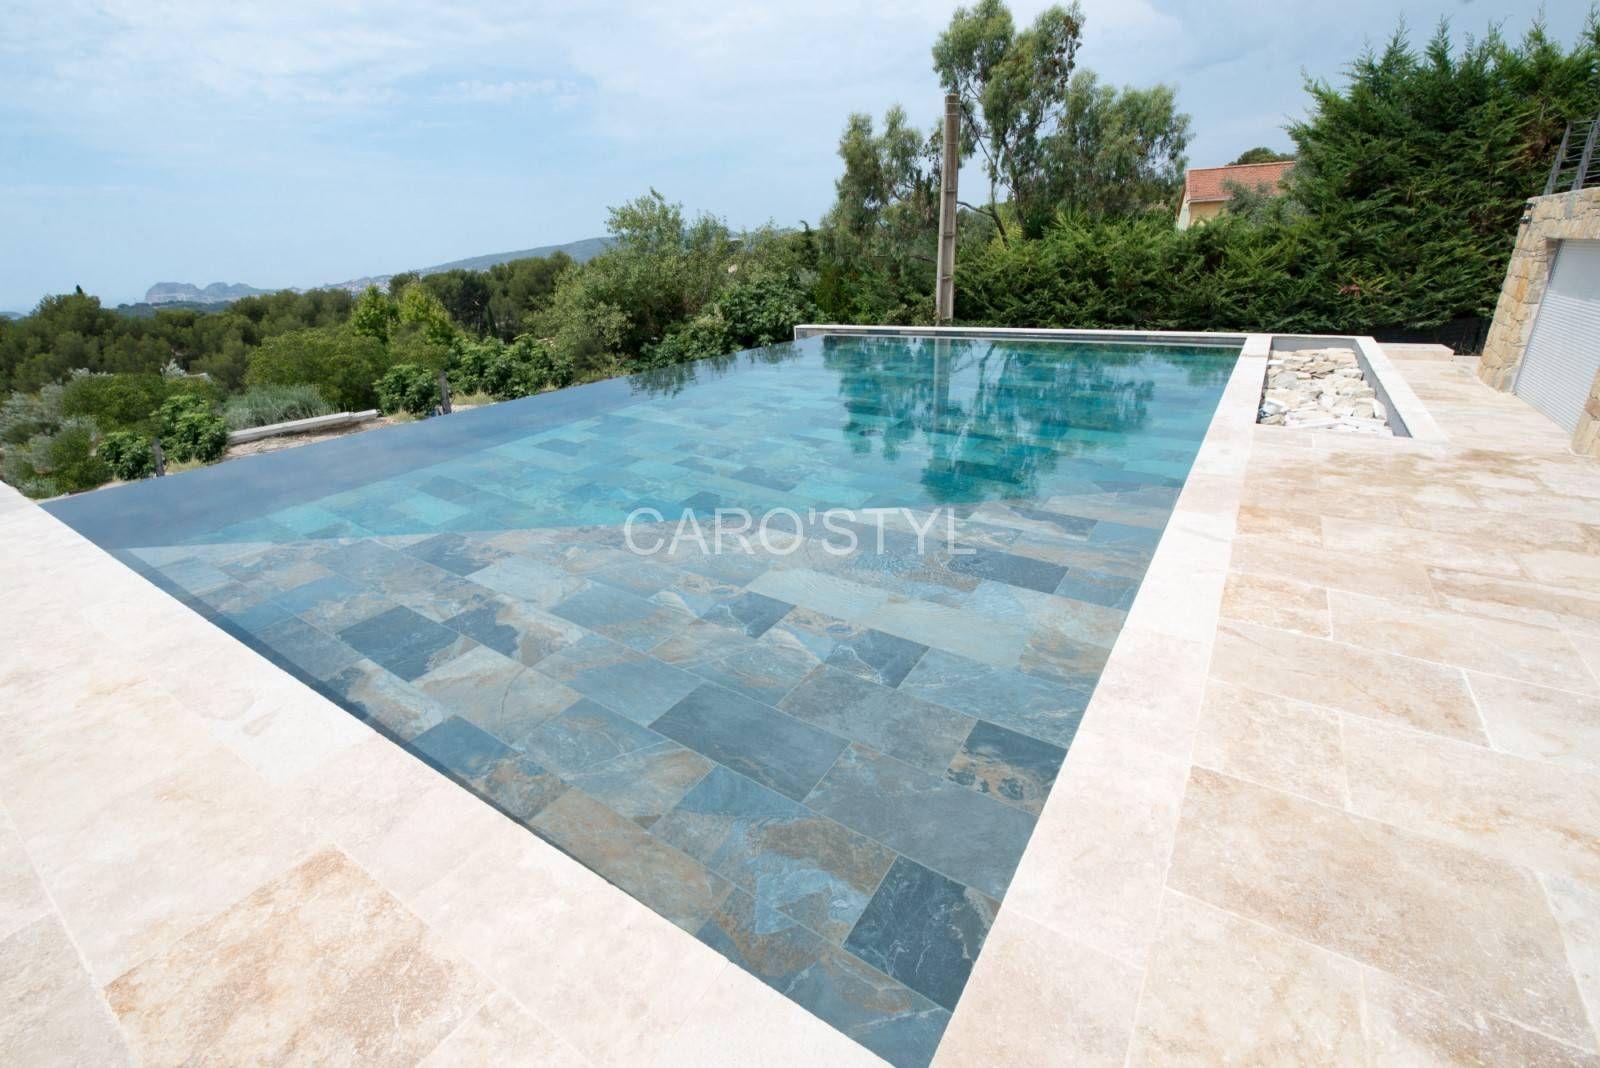 Carrelage Green Bali® 30X60 , Pour Un Bassin Avant Gardiste ... encequiconcerne Green Bali 30X60